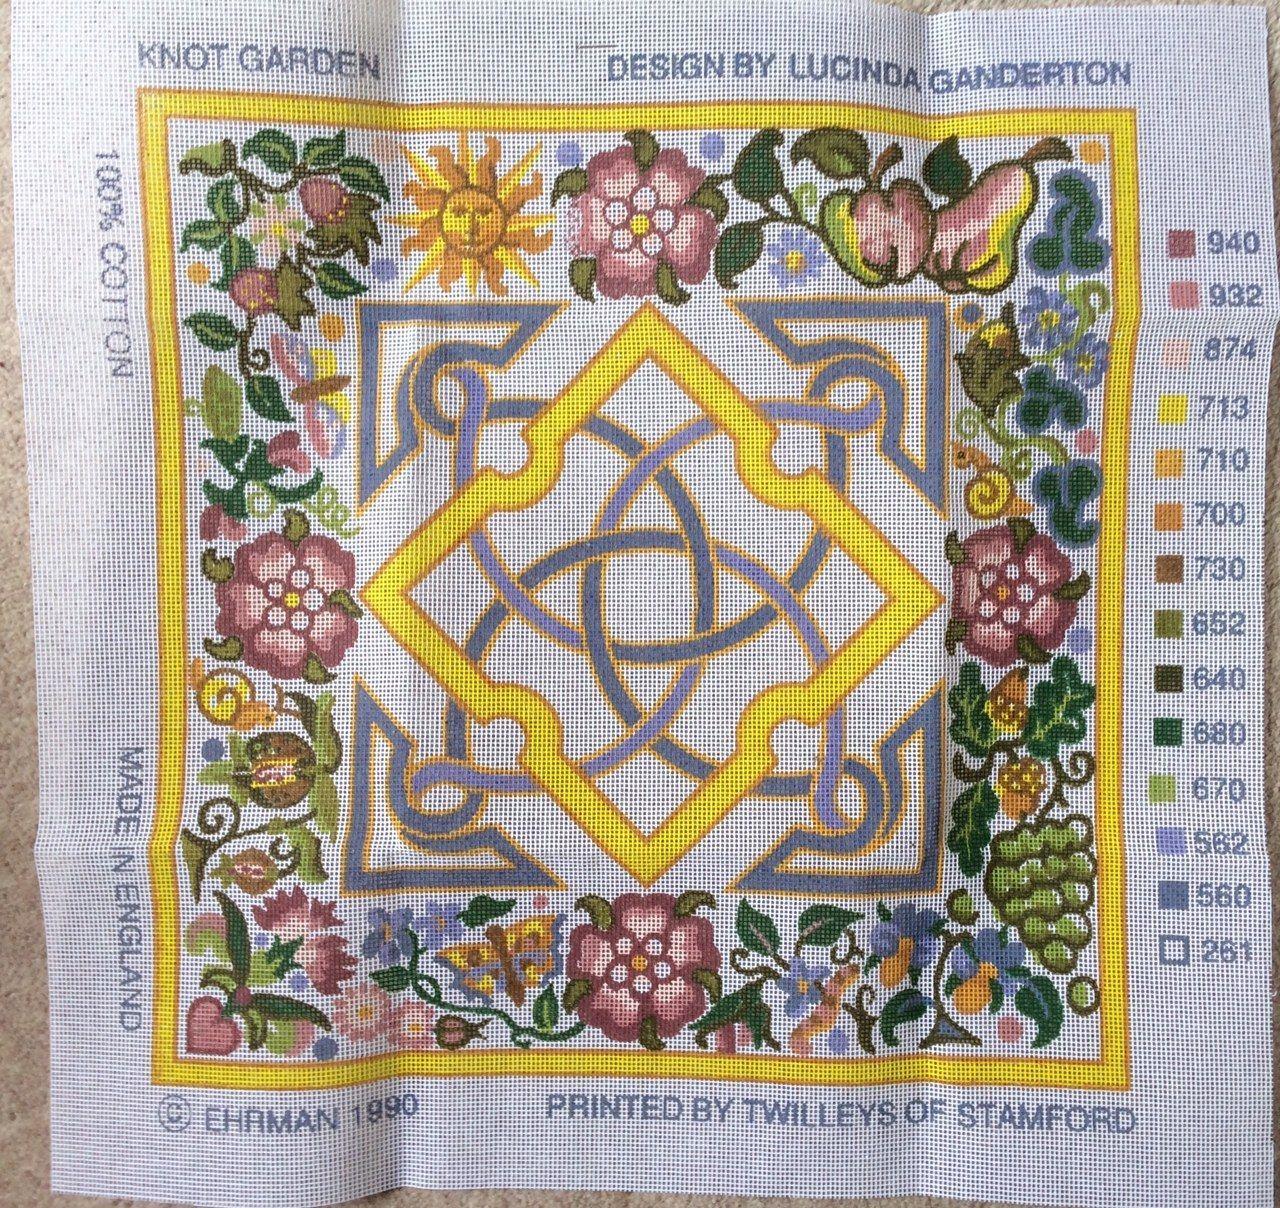 Ehrman Tapestry Needlepoint Kit Knot Garden Lucinda Ganderton